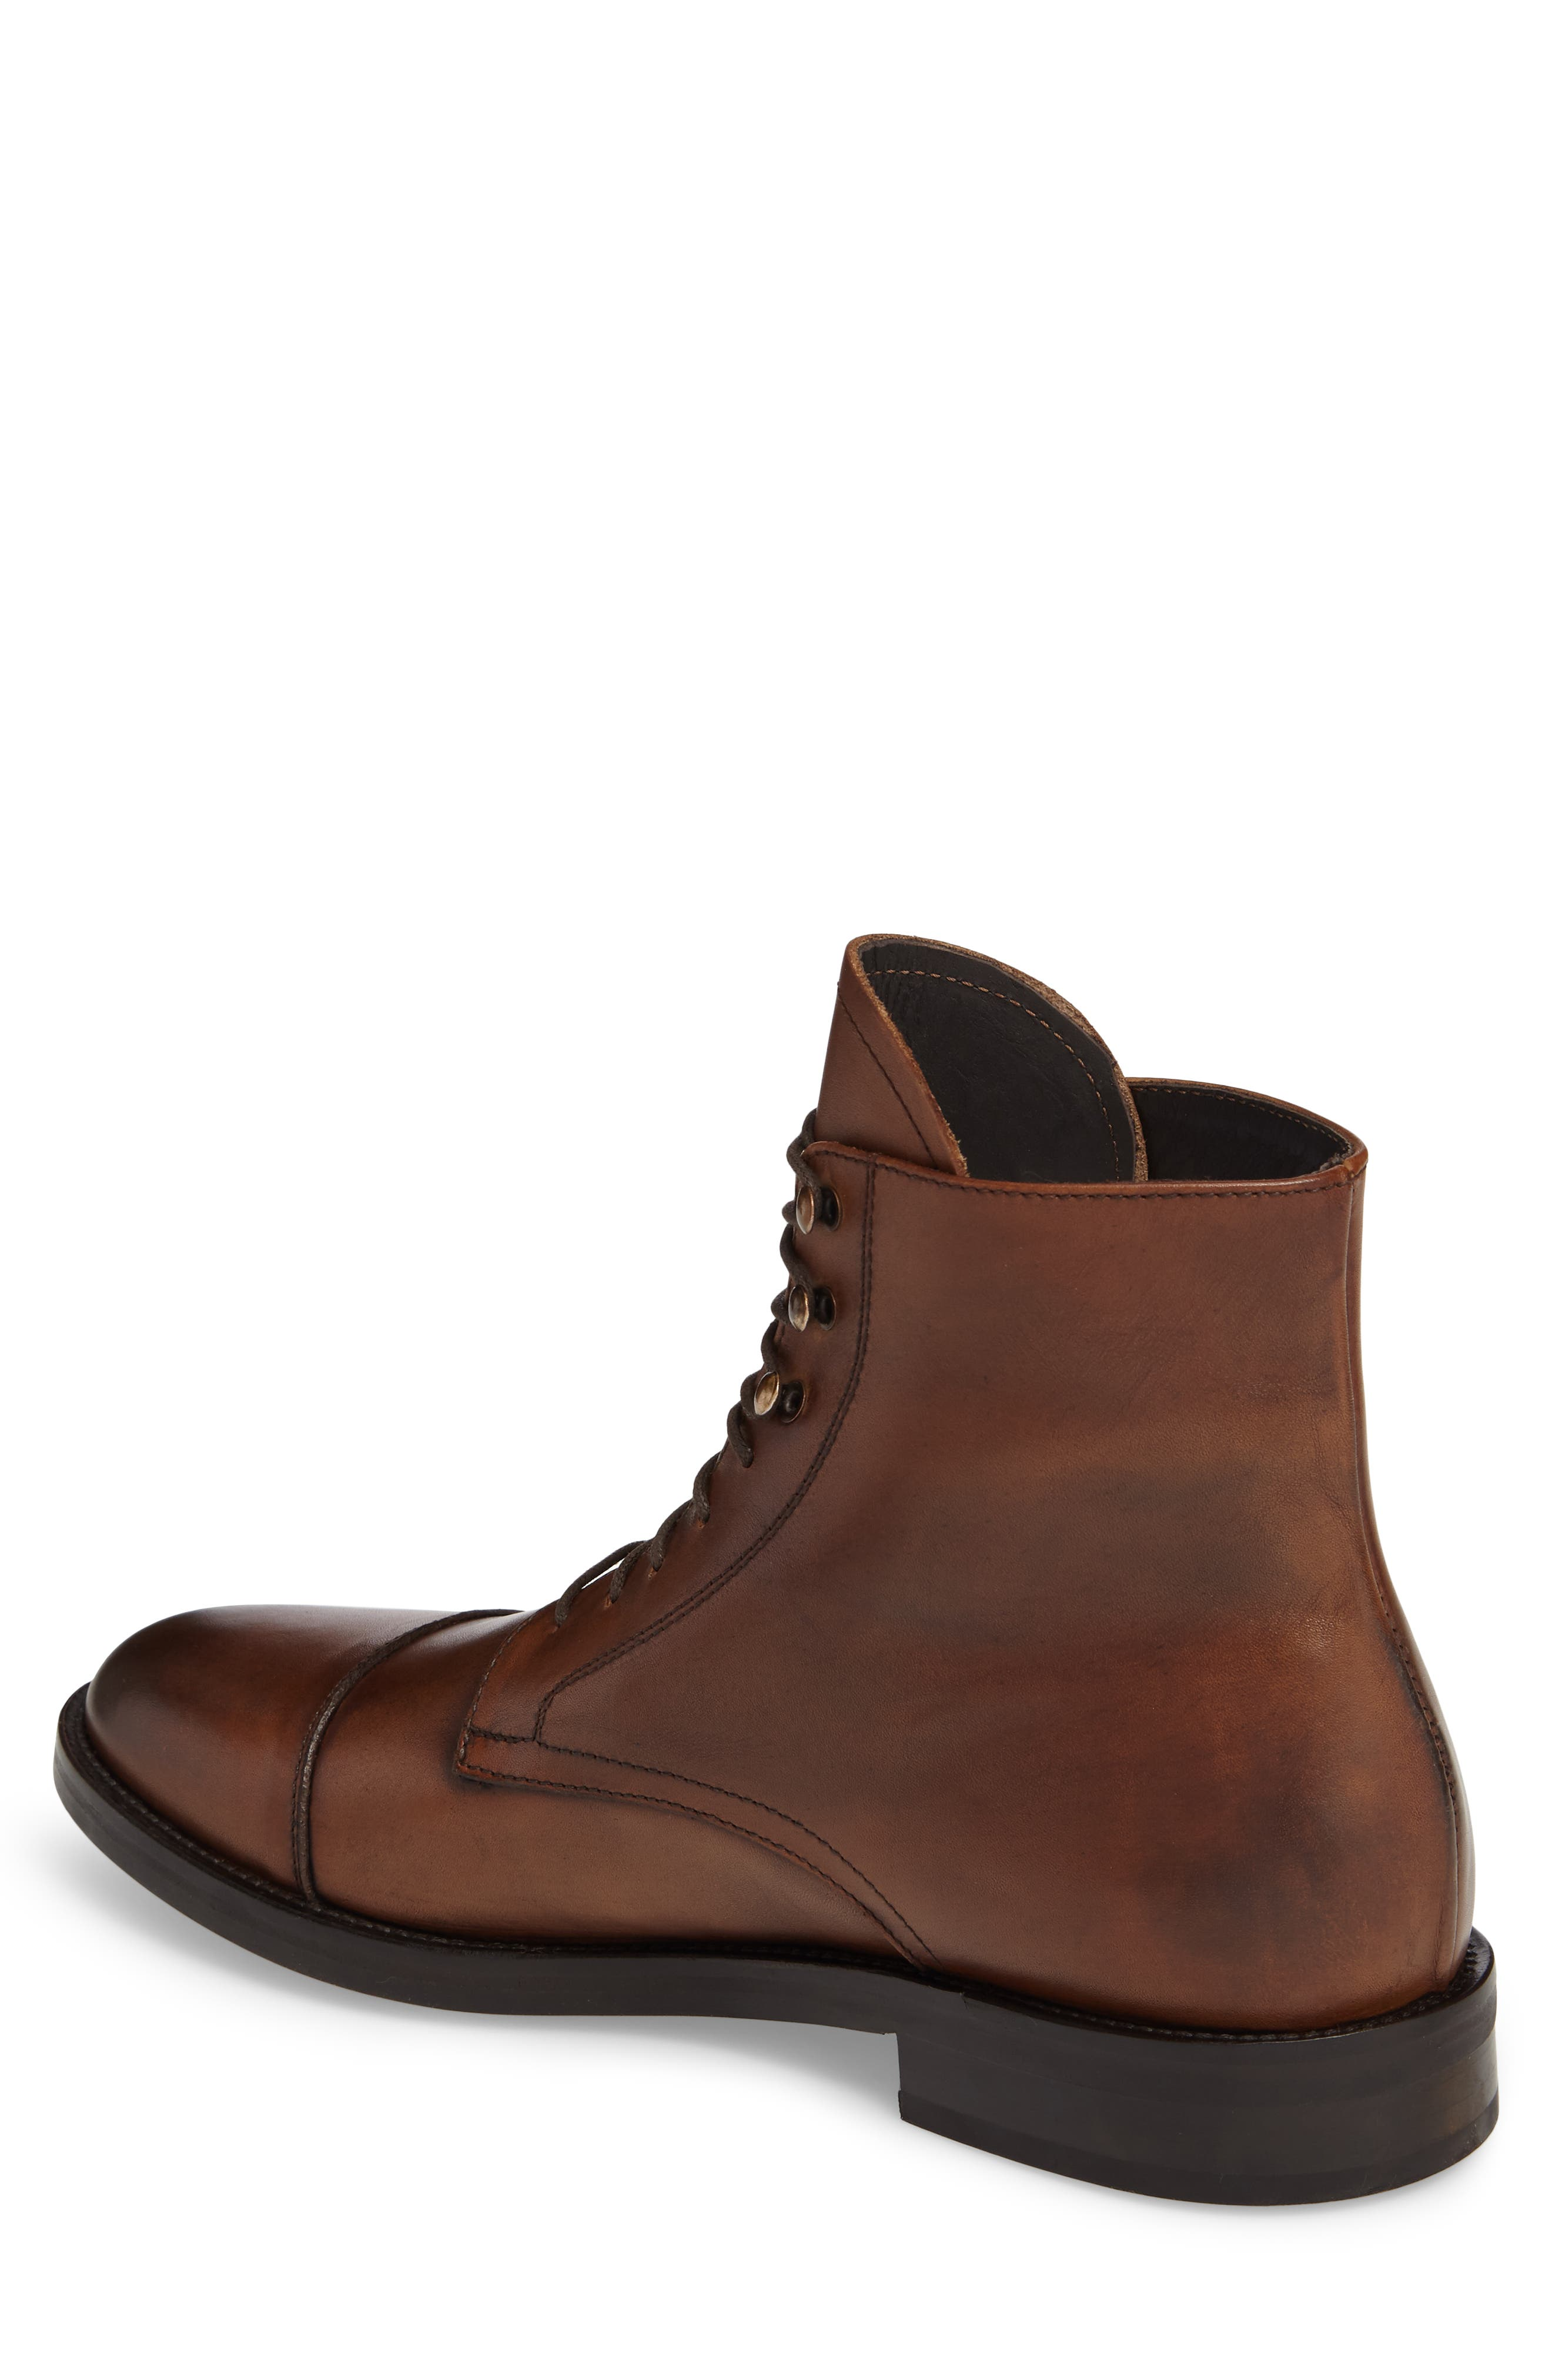 Henri Cap Toe Boot,                             Alternate thumbnail 2, color,                             Cuoio Leather